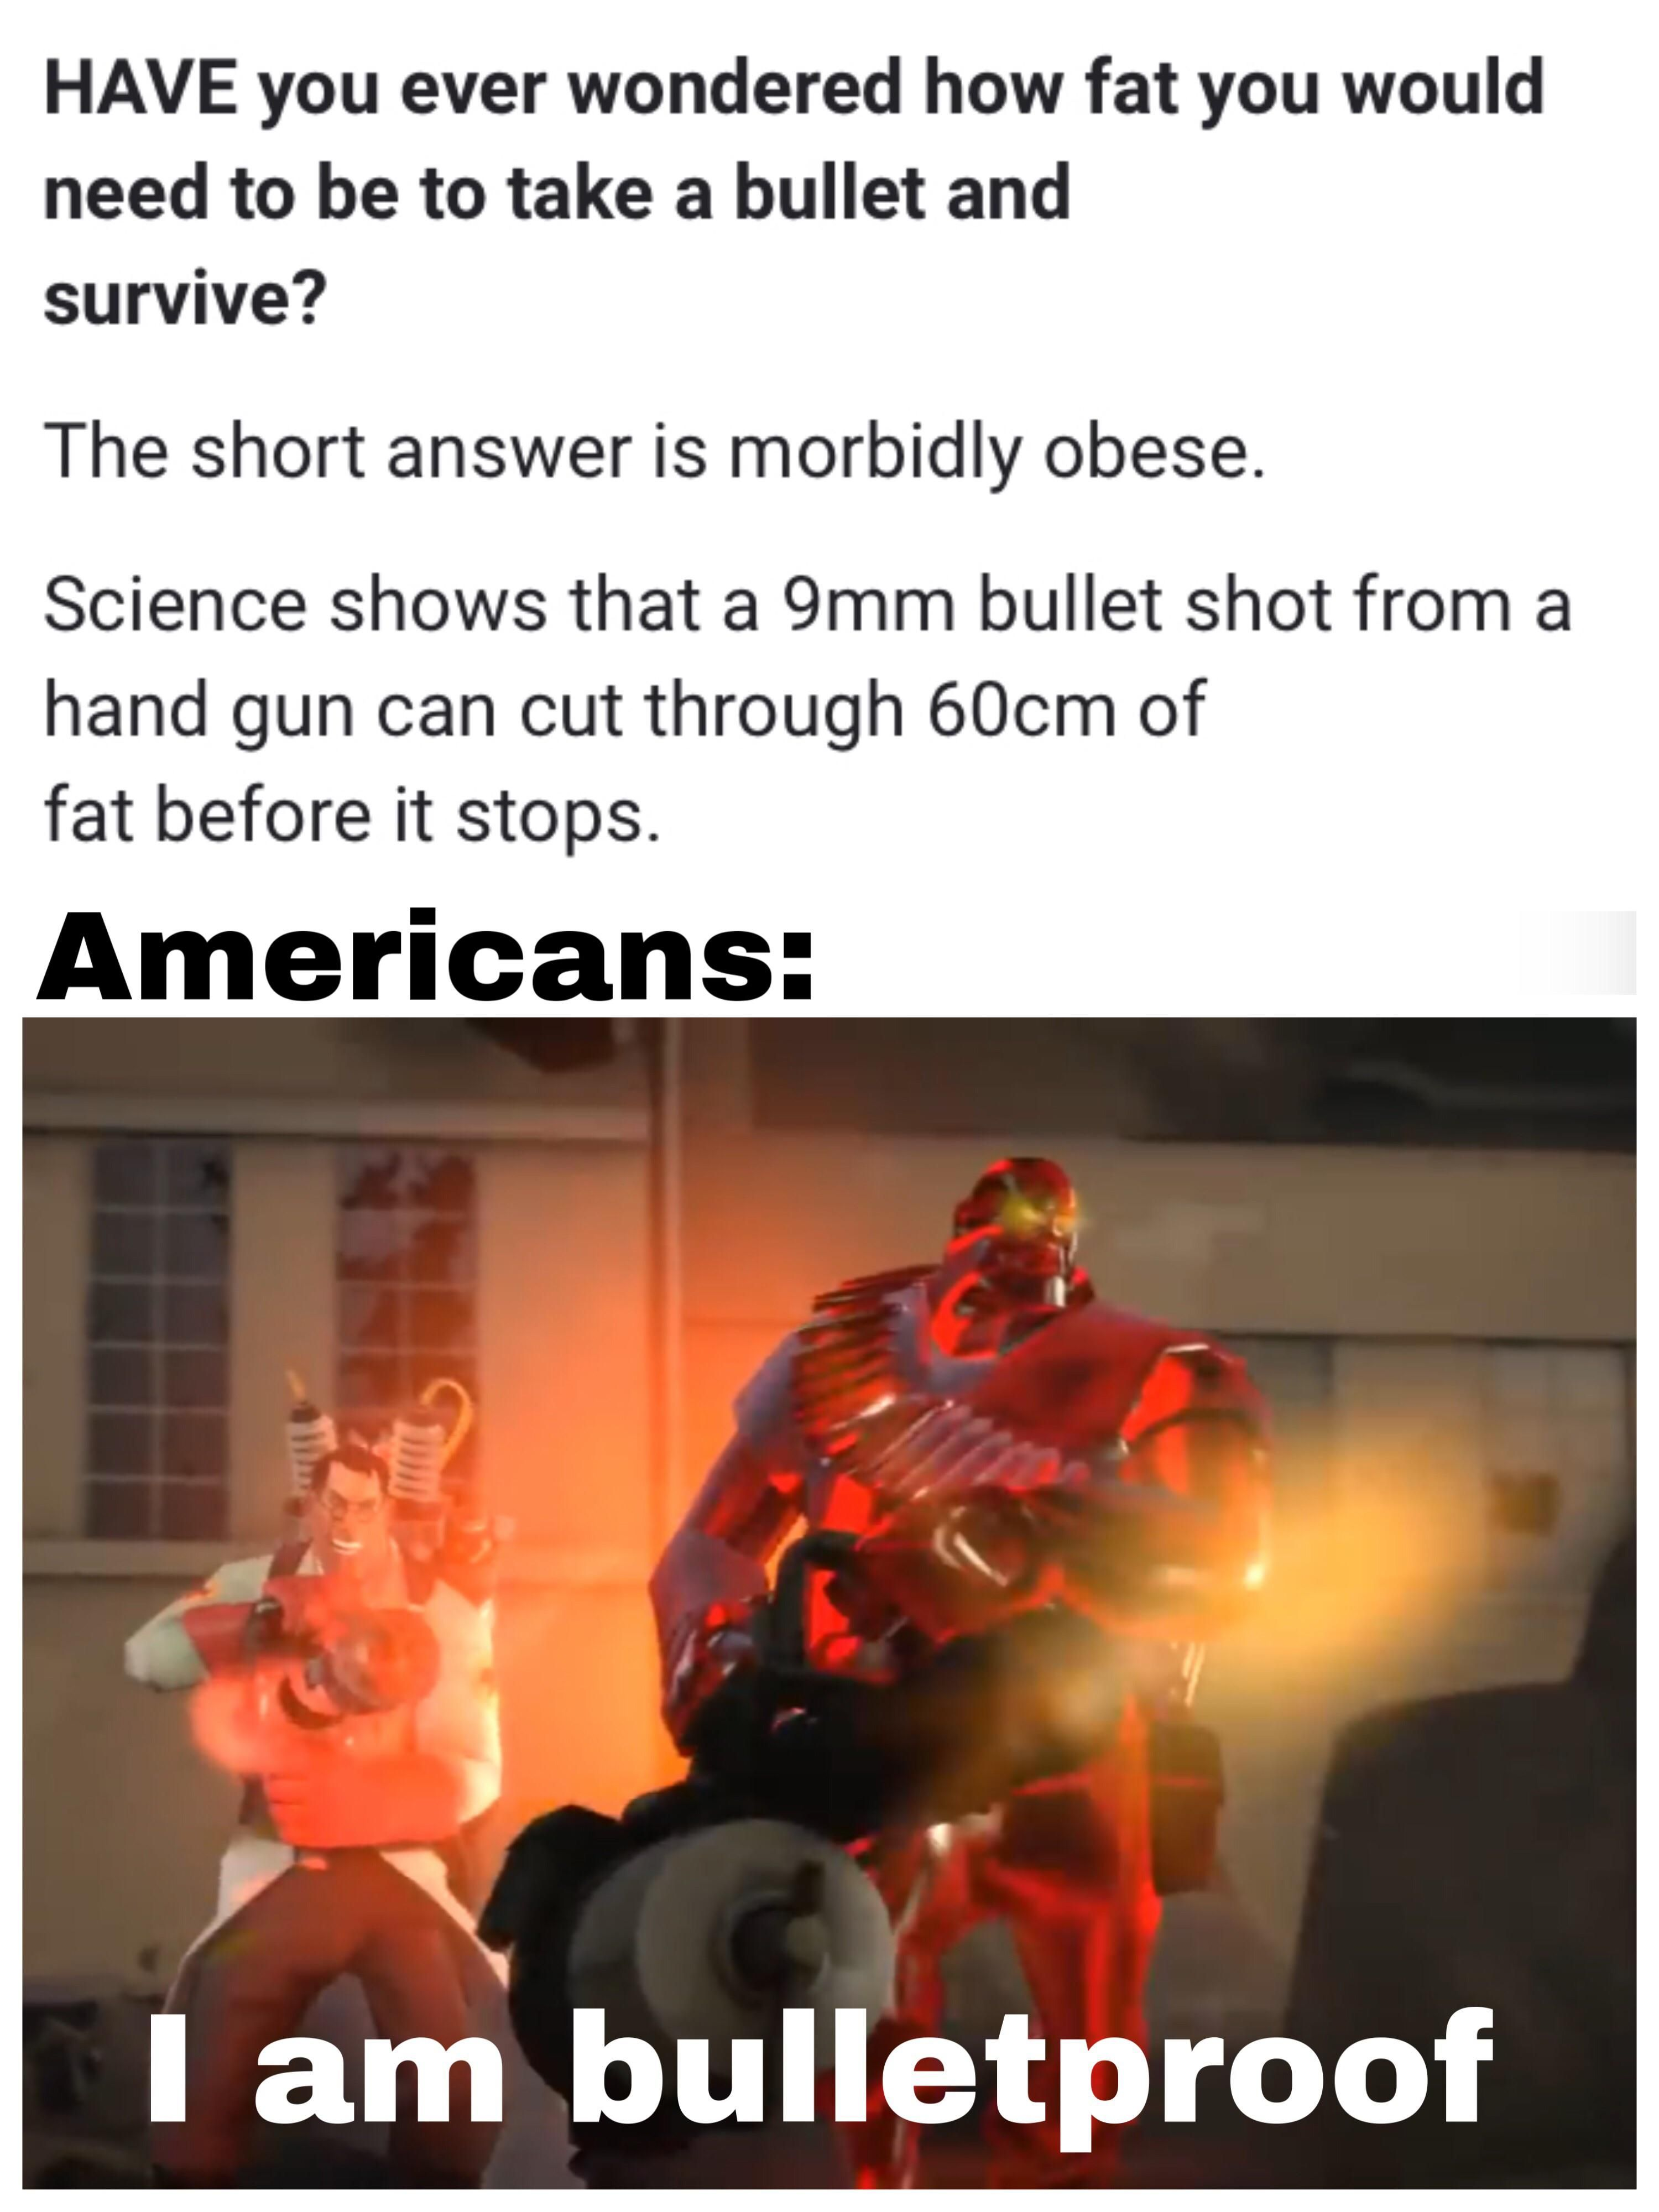 Americans adapting